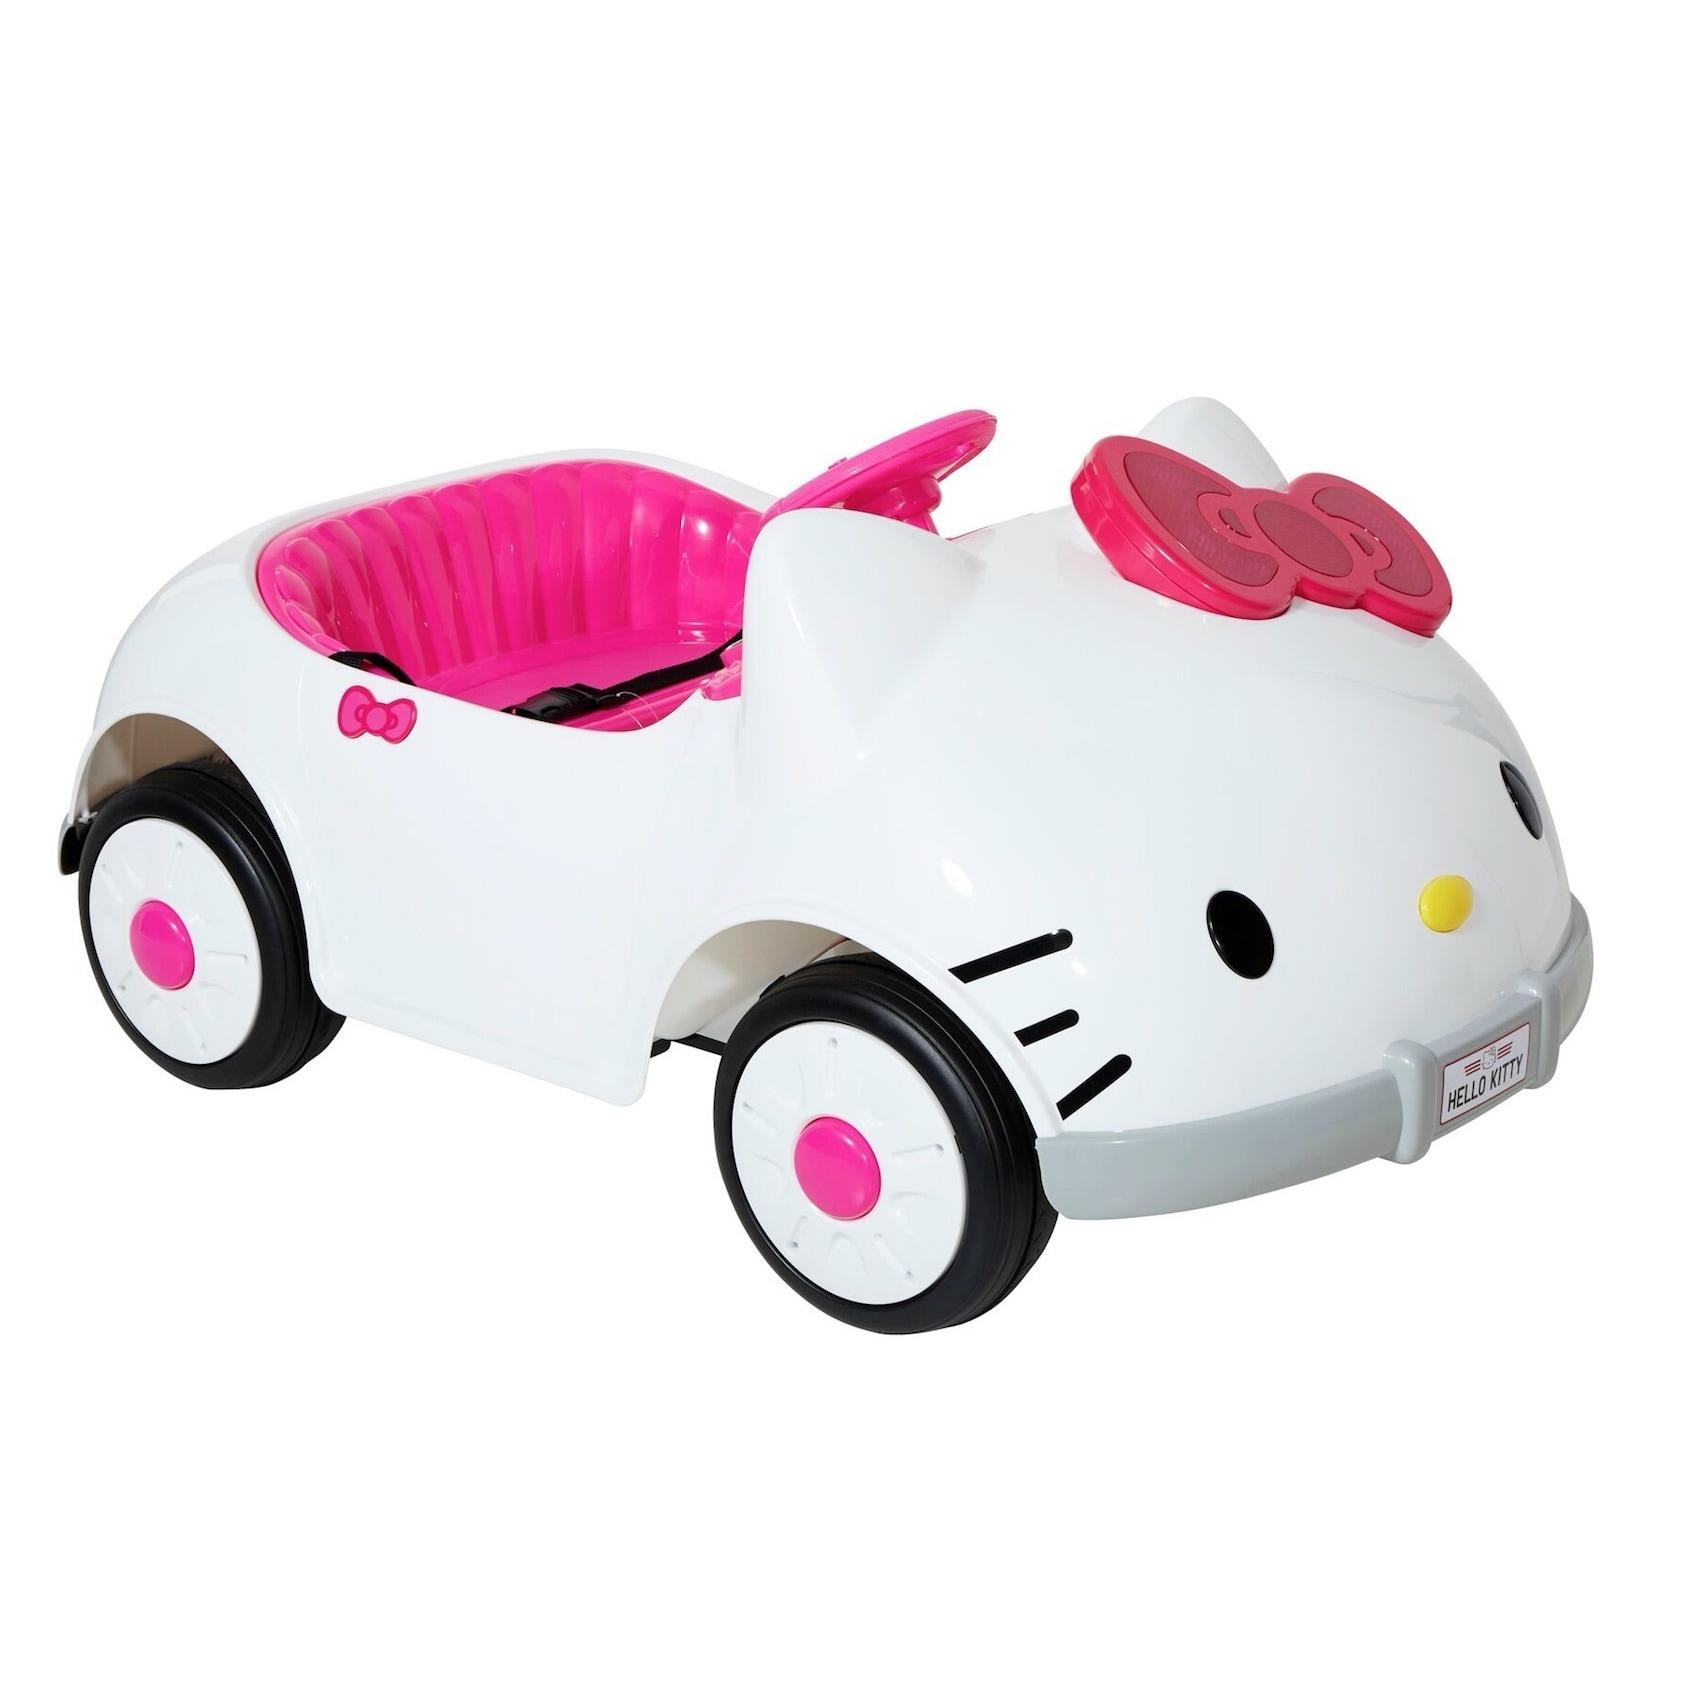 Kids Ride on Hello Kitty Car Girls Children Powered Riding Toy